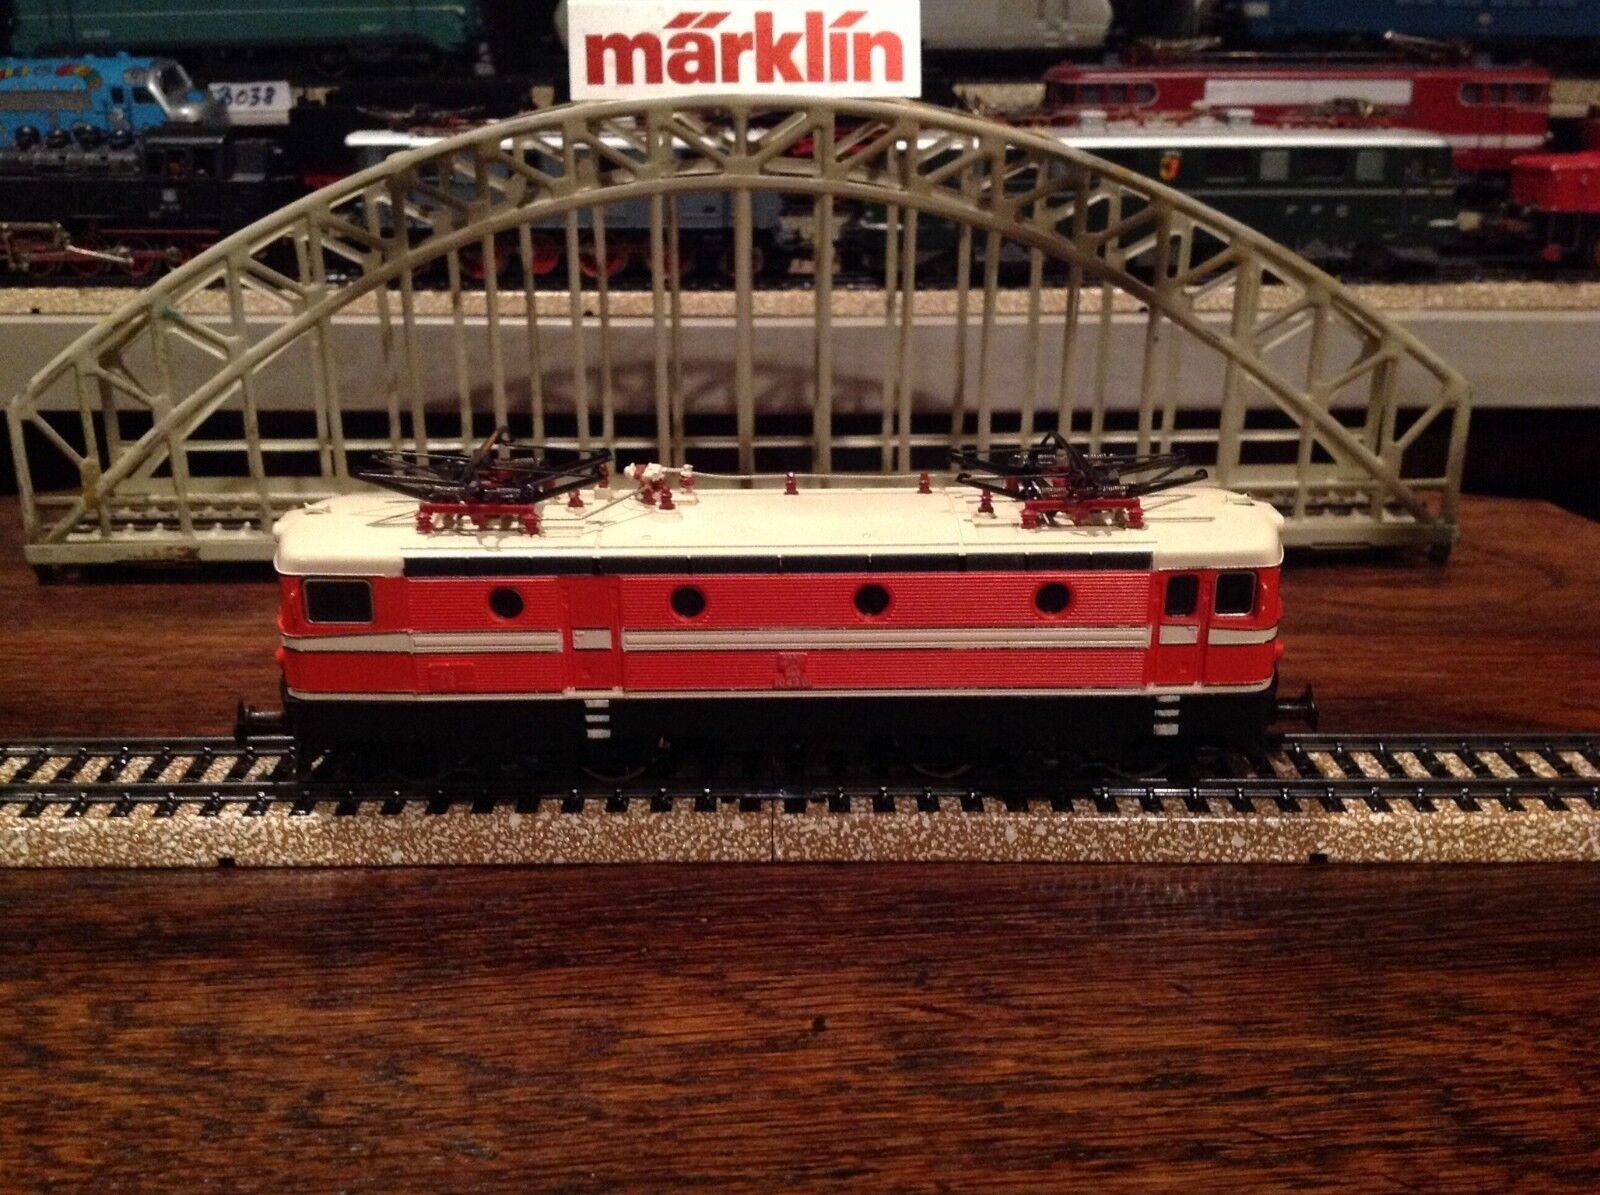 Marklin 3041 Electric loco, 4-4, Ho sacle, Austrian railways,original box